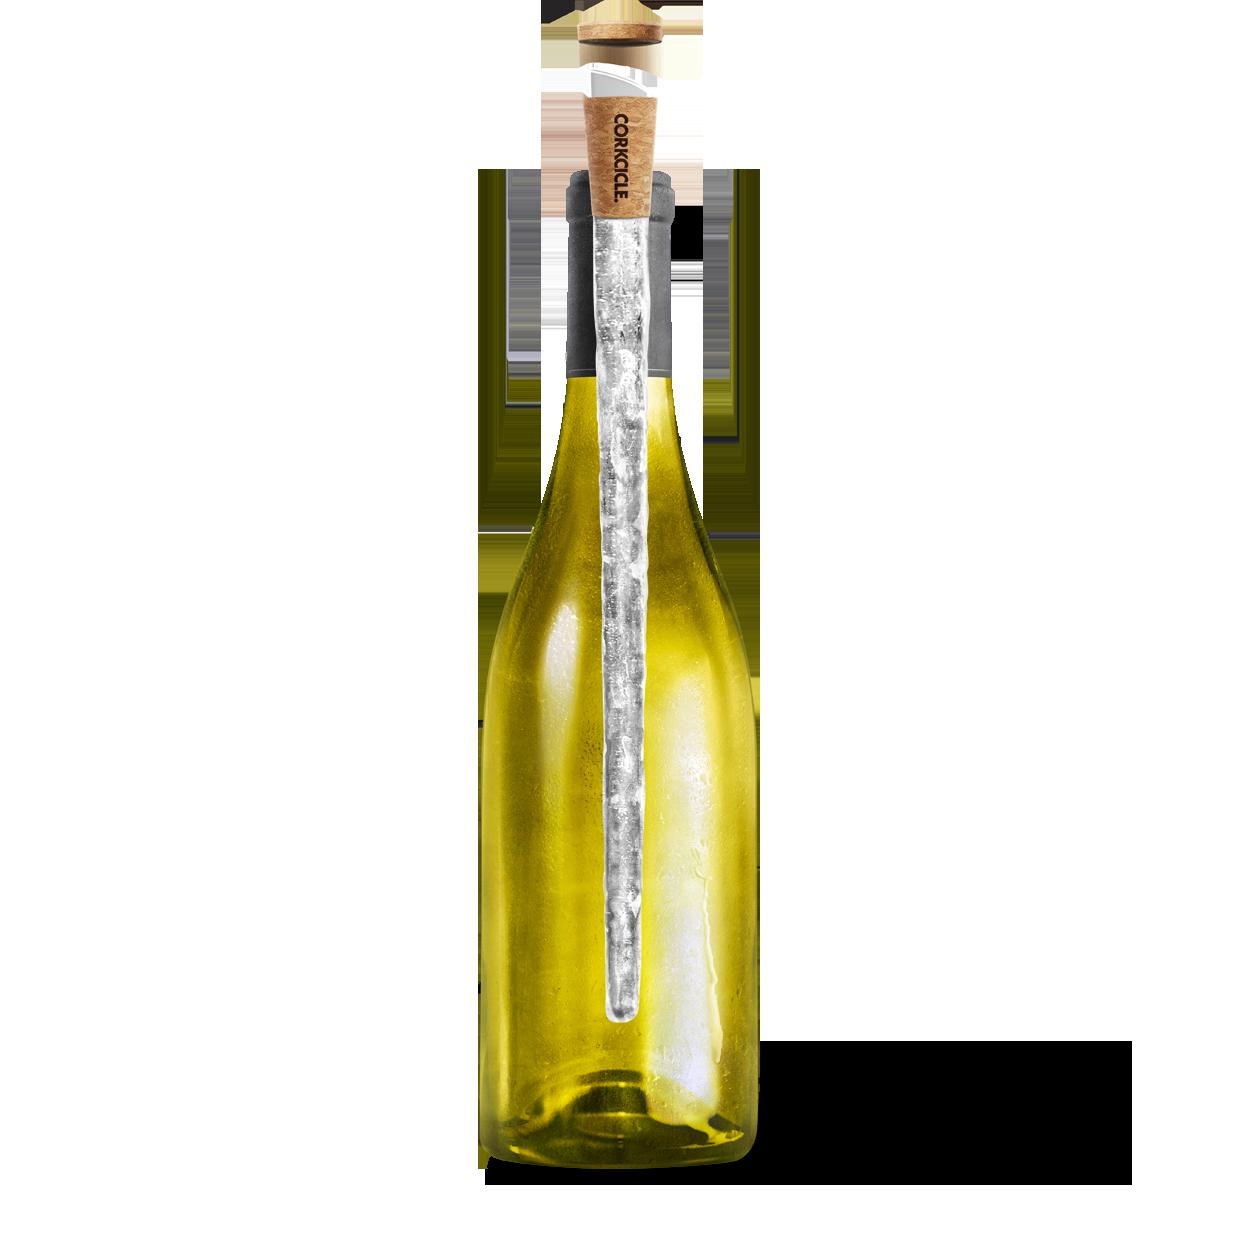 Air Wine - $25